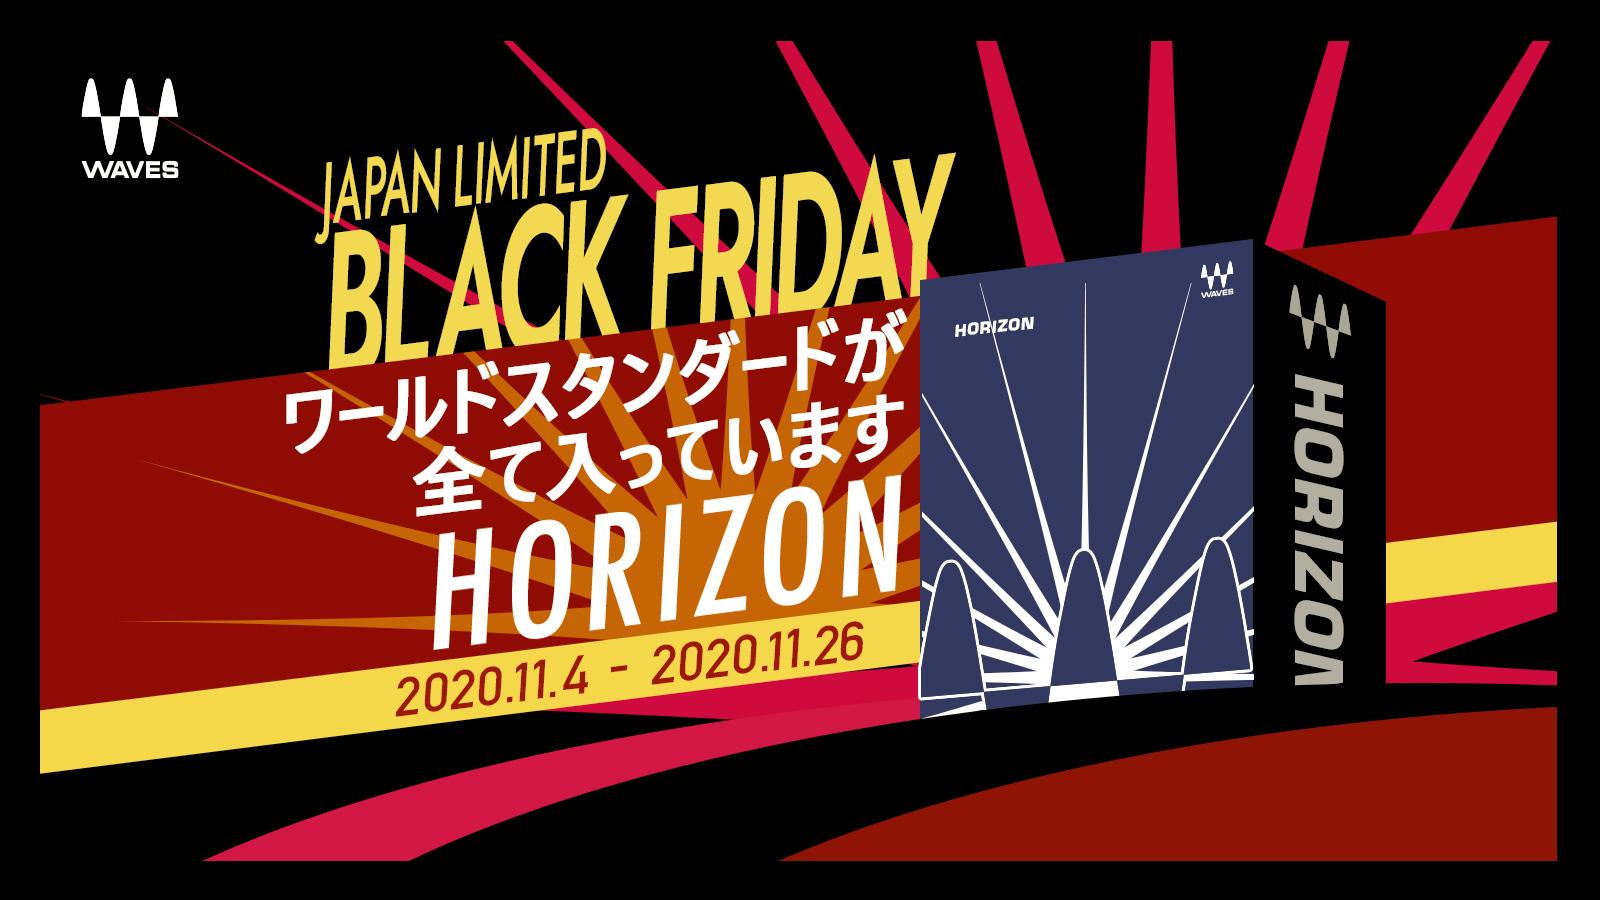 1_20201104_waves_jpn_horizon_l1600